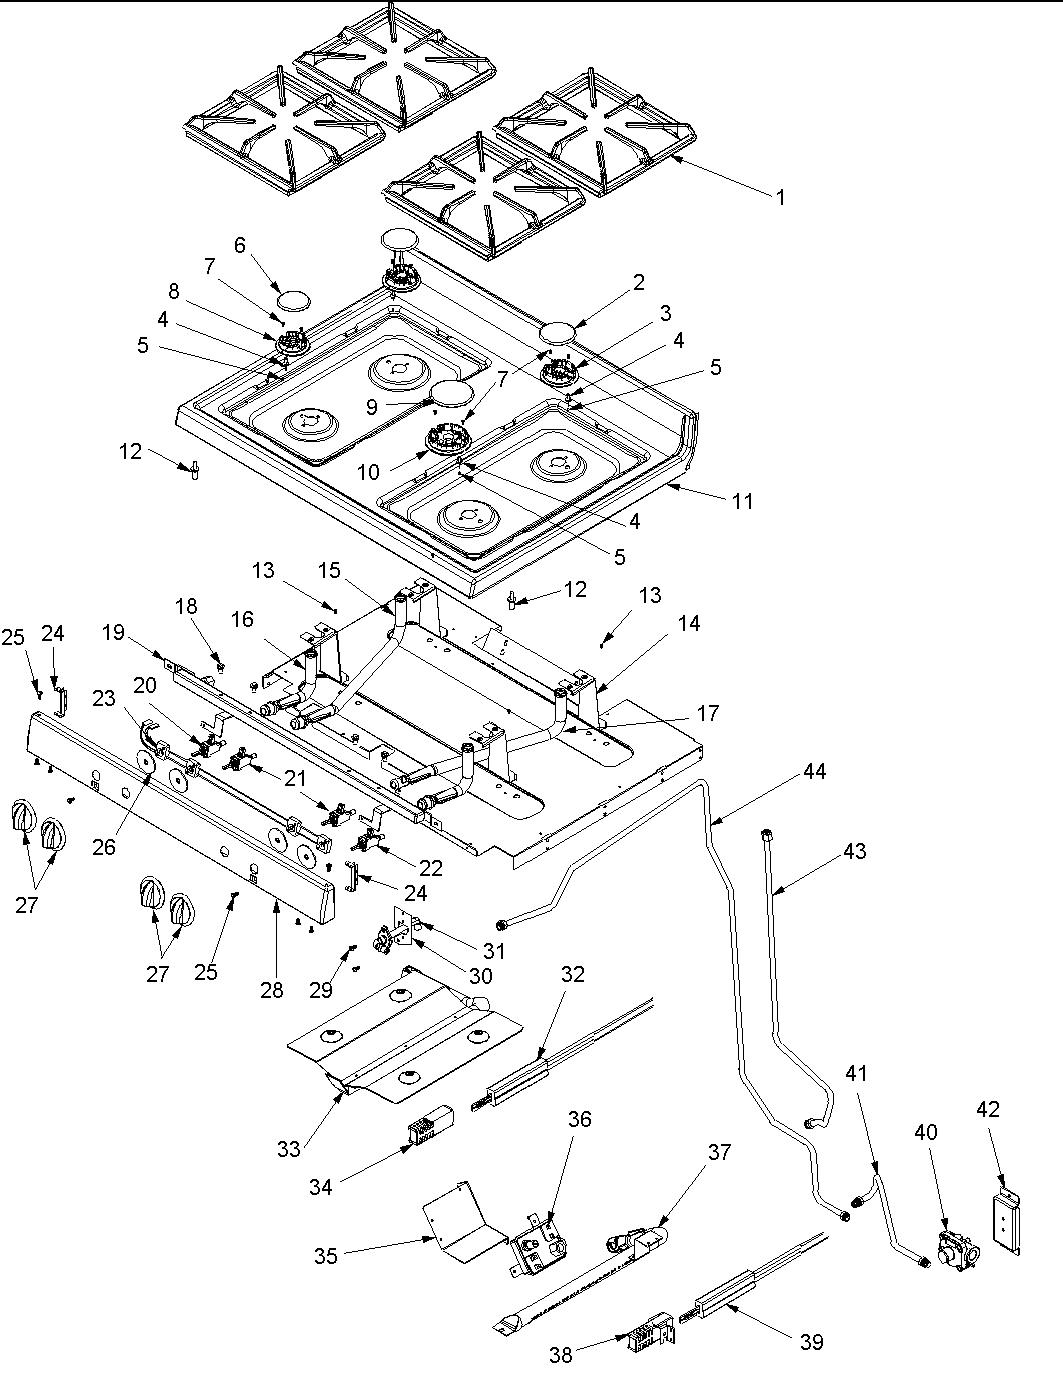 [SODI_2457]   Gas Cooktop Schematic Bolens Riding Mower Wiring Diagram -  auto-car2005.1996.the-rocks.it | Amana Electric Range Wiring Diagram |  | Bege Wiring Diagram Source Full Edition